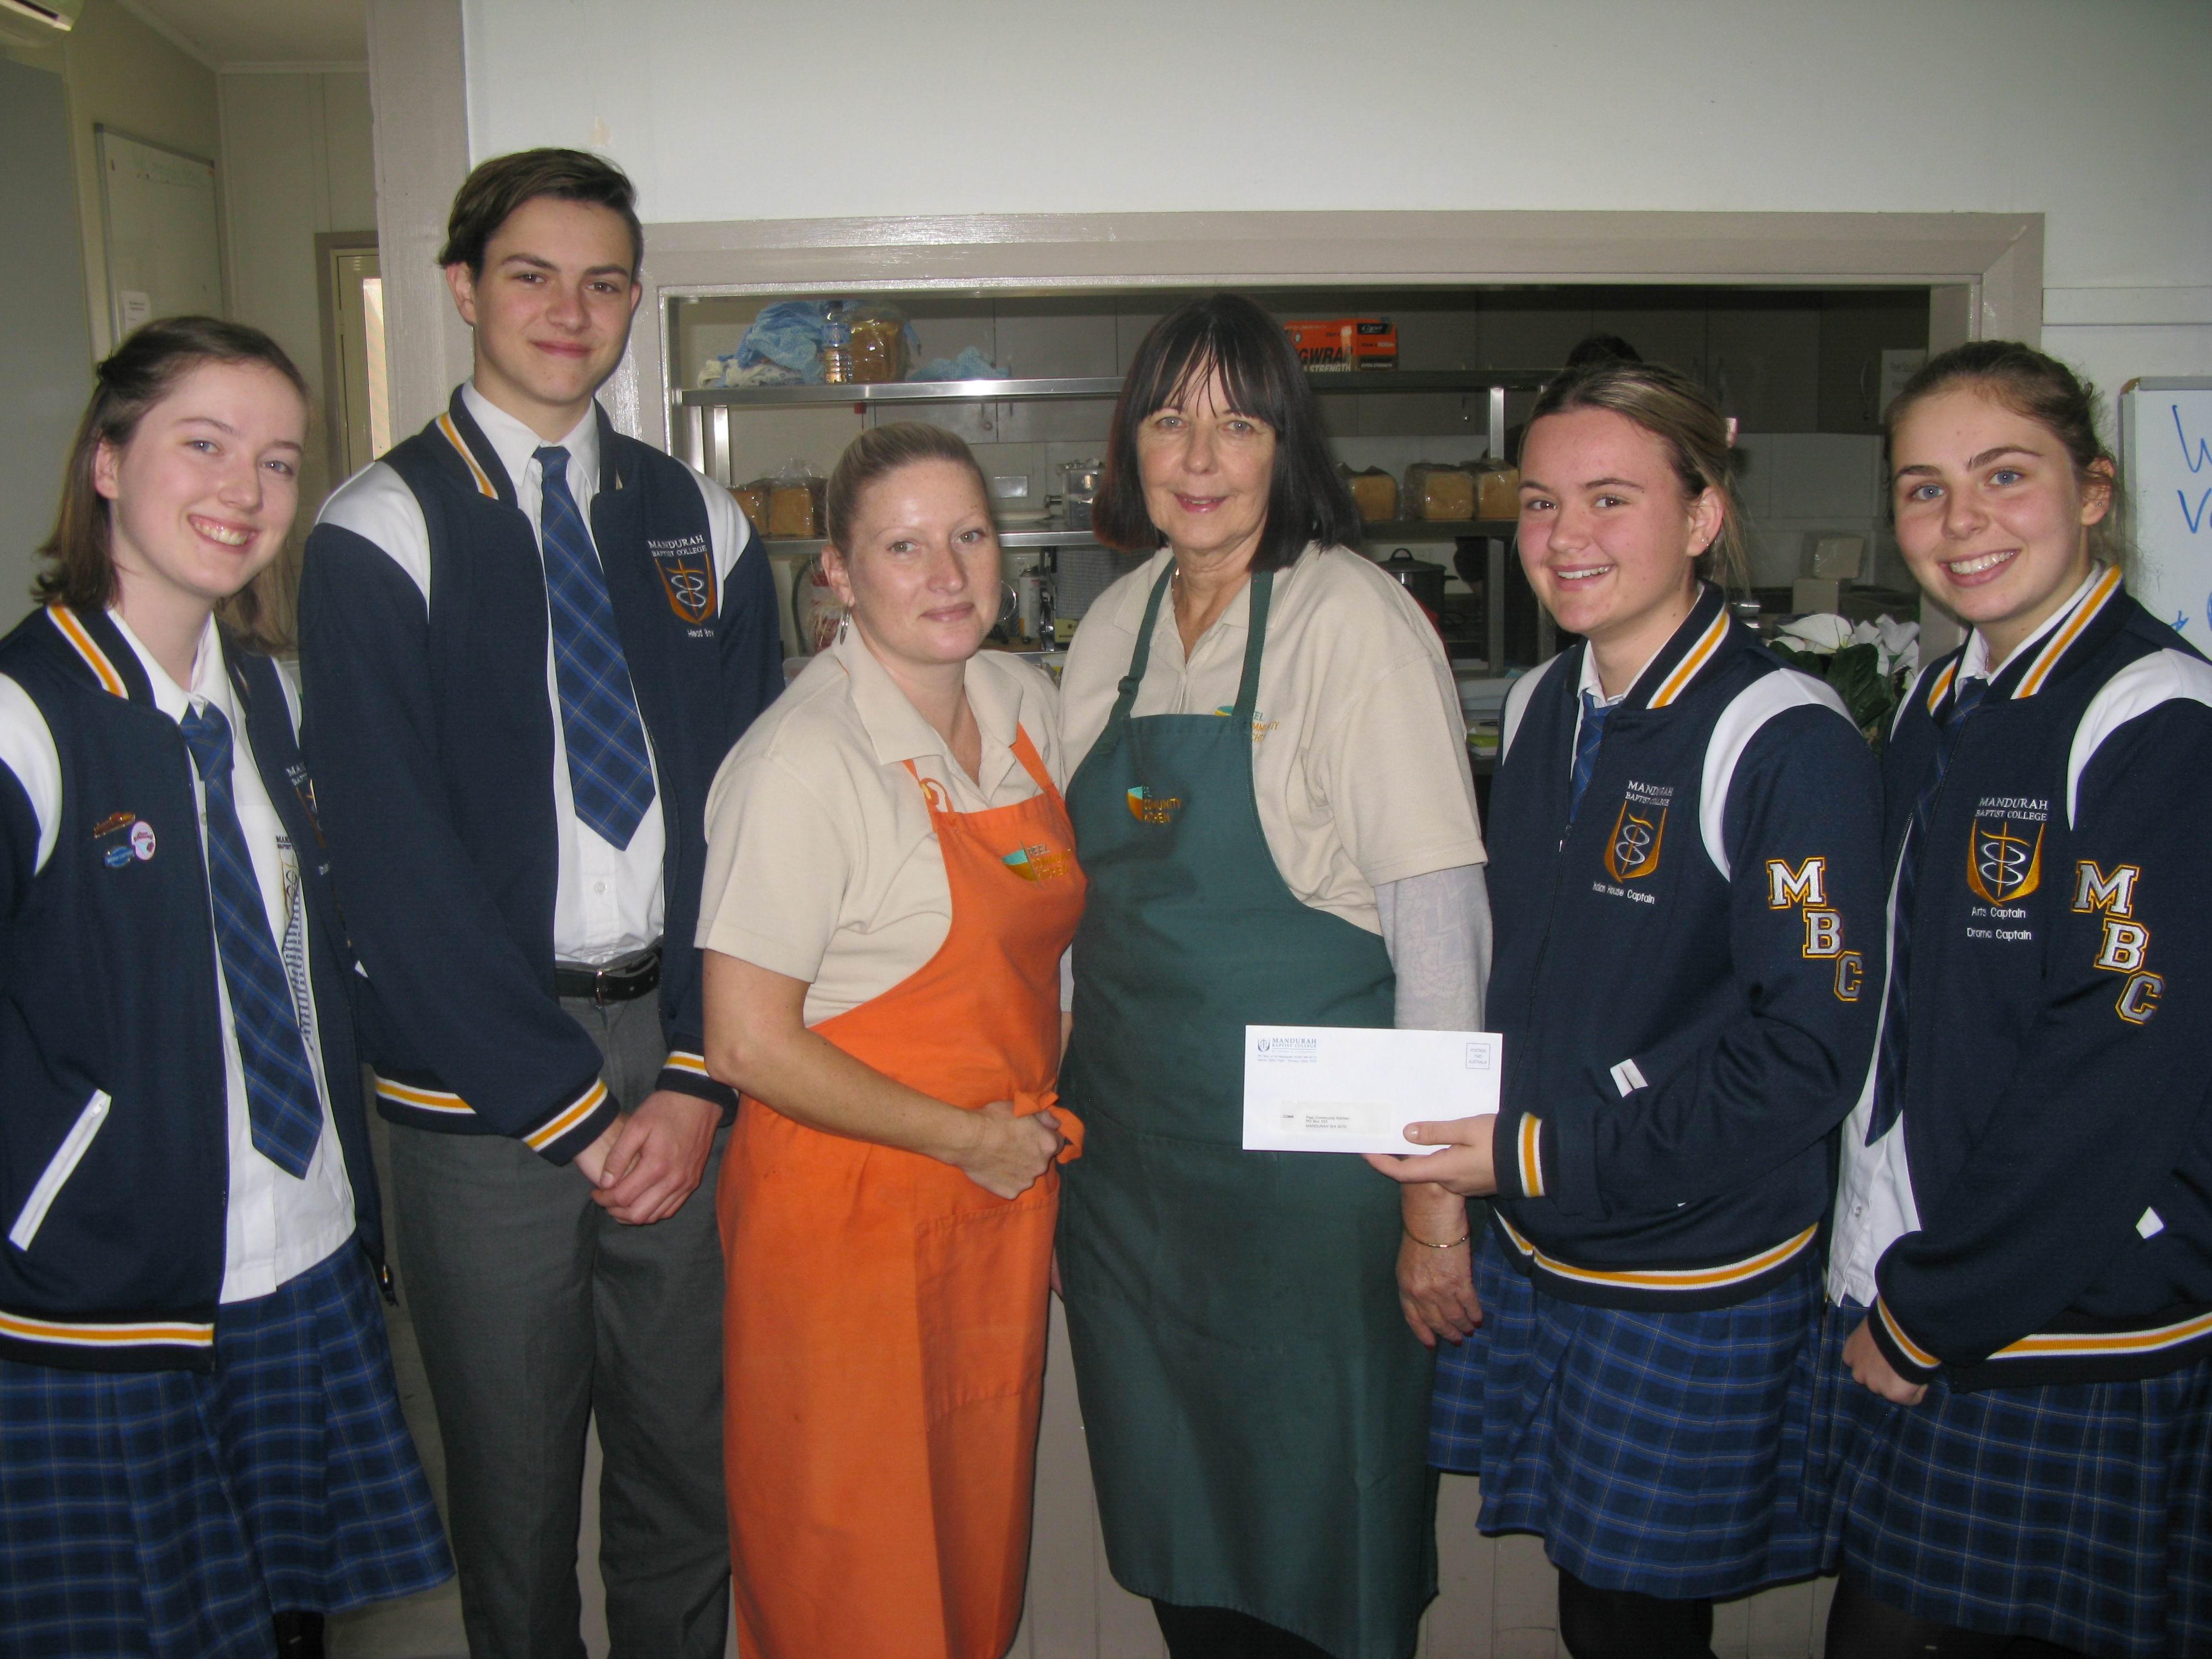 Mandurah Baptist College students donate $600 to Peel Community Kitchen